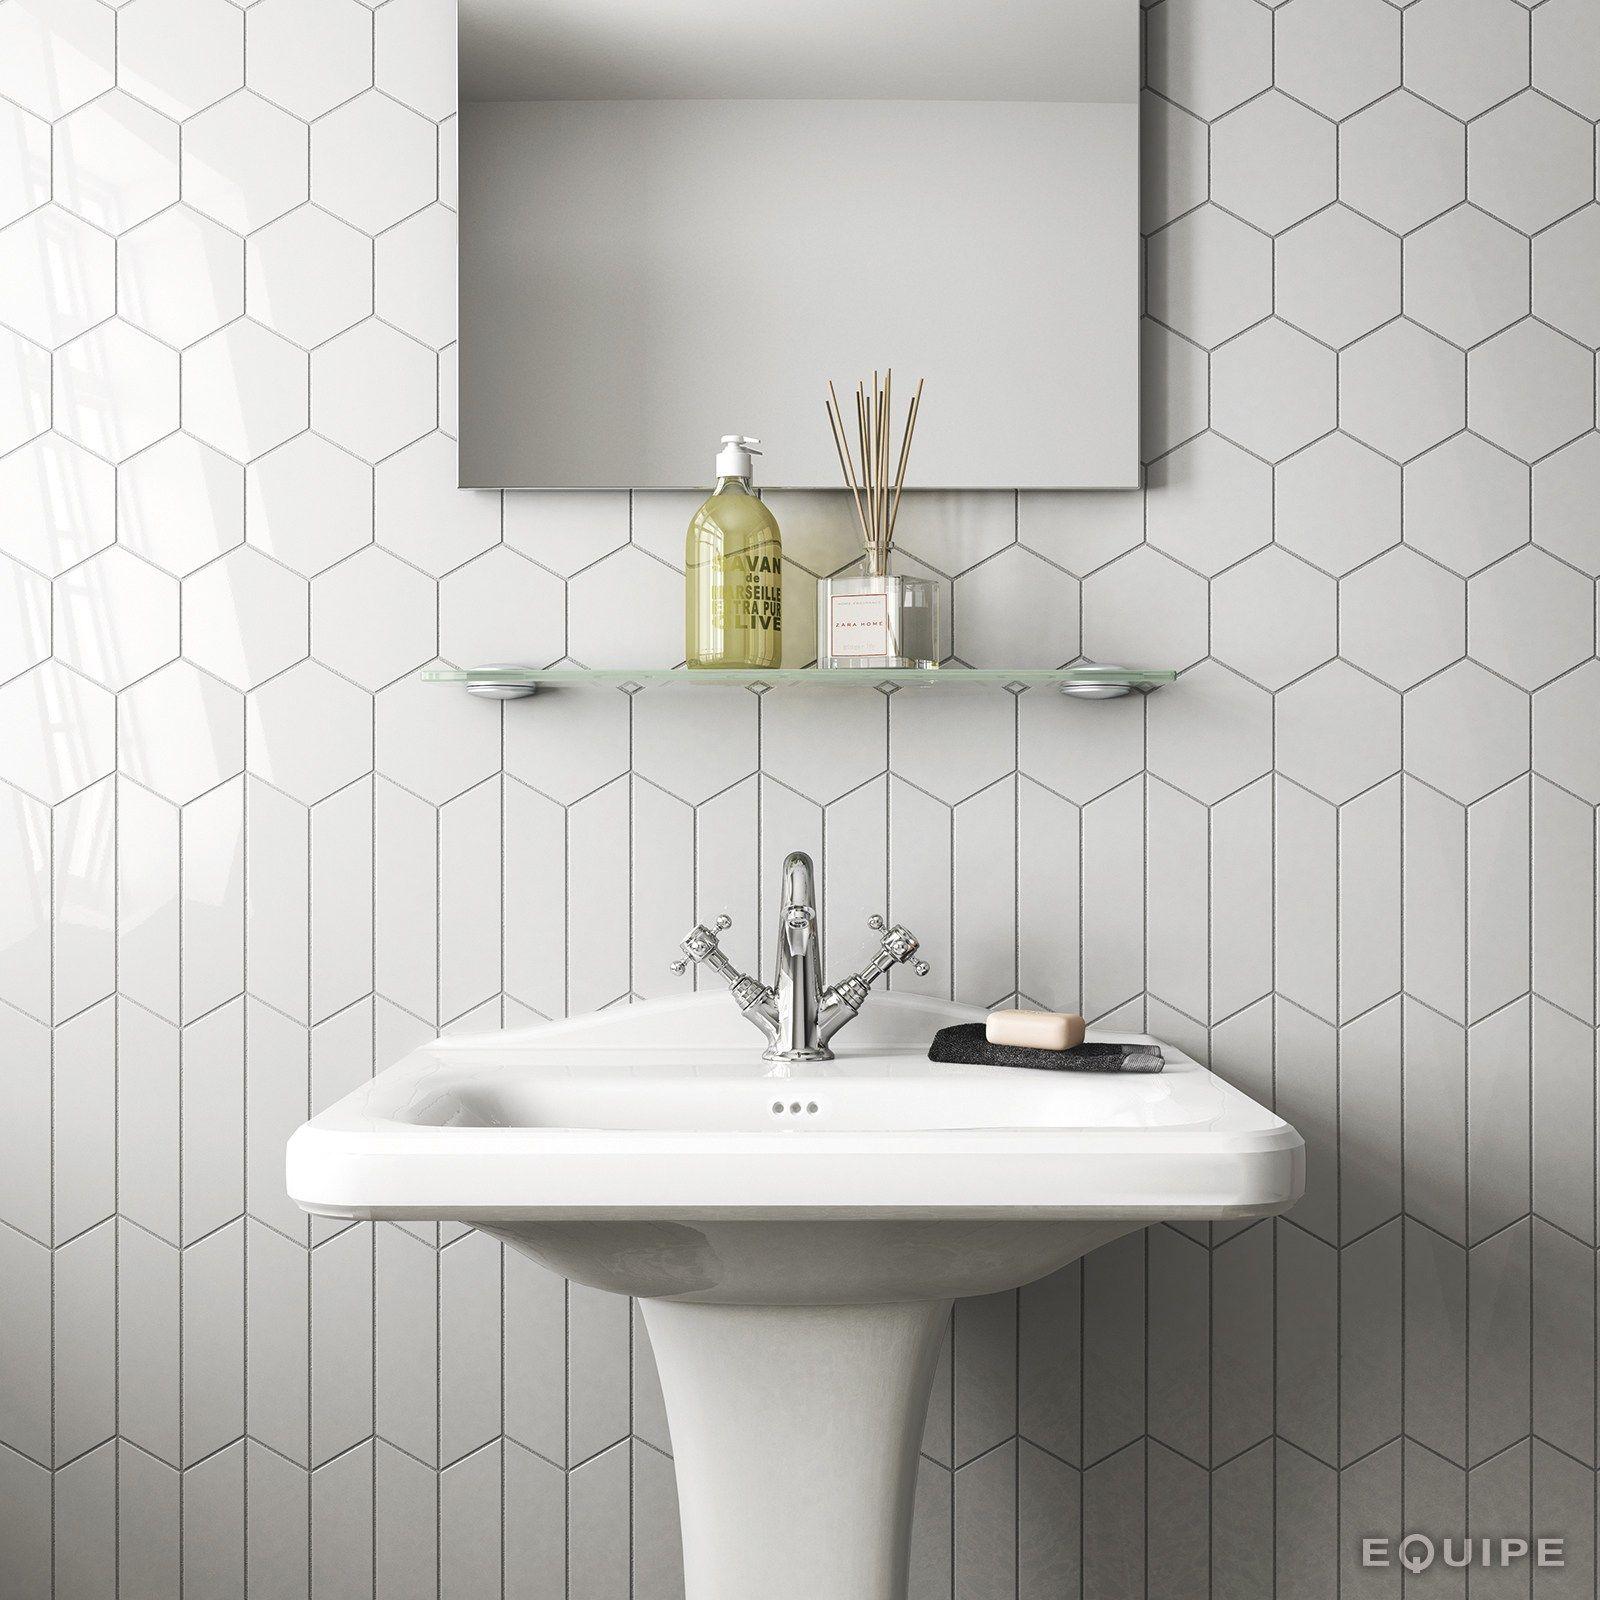 CHEVRON WALL Wall tiles by EQUIPE CERAMICAS | Nowa łazienka | Pinterest